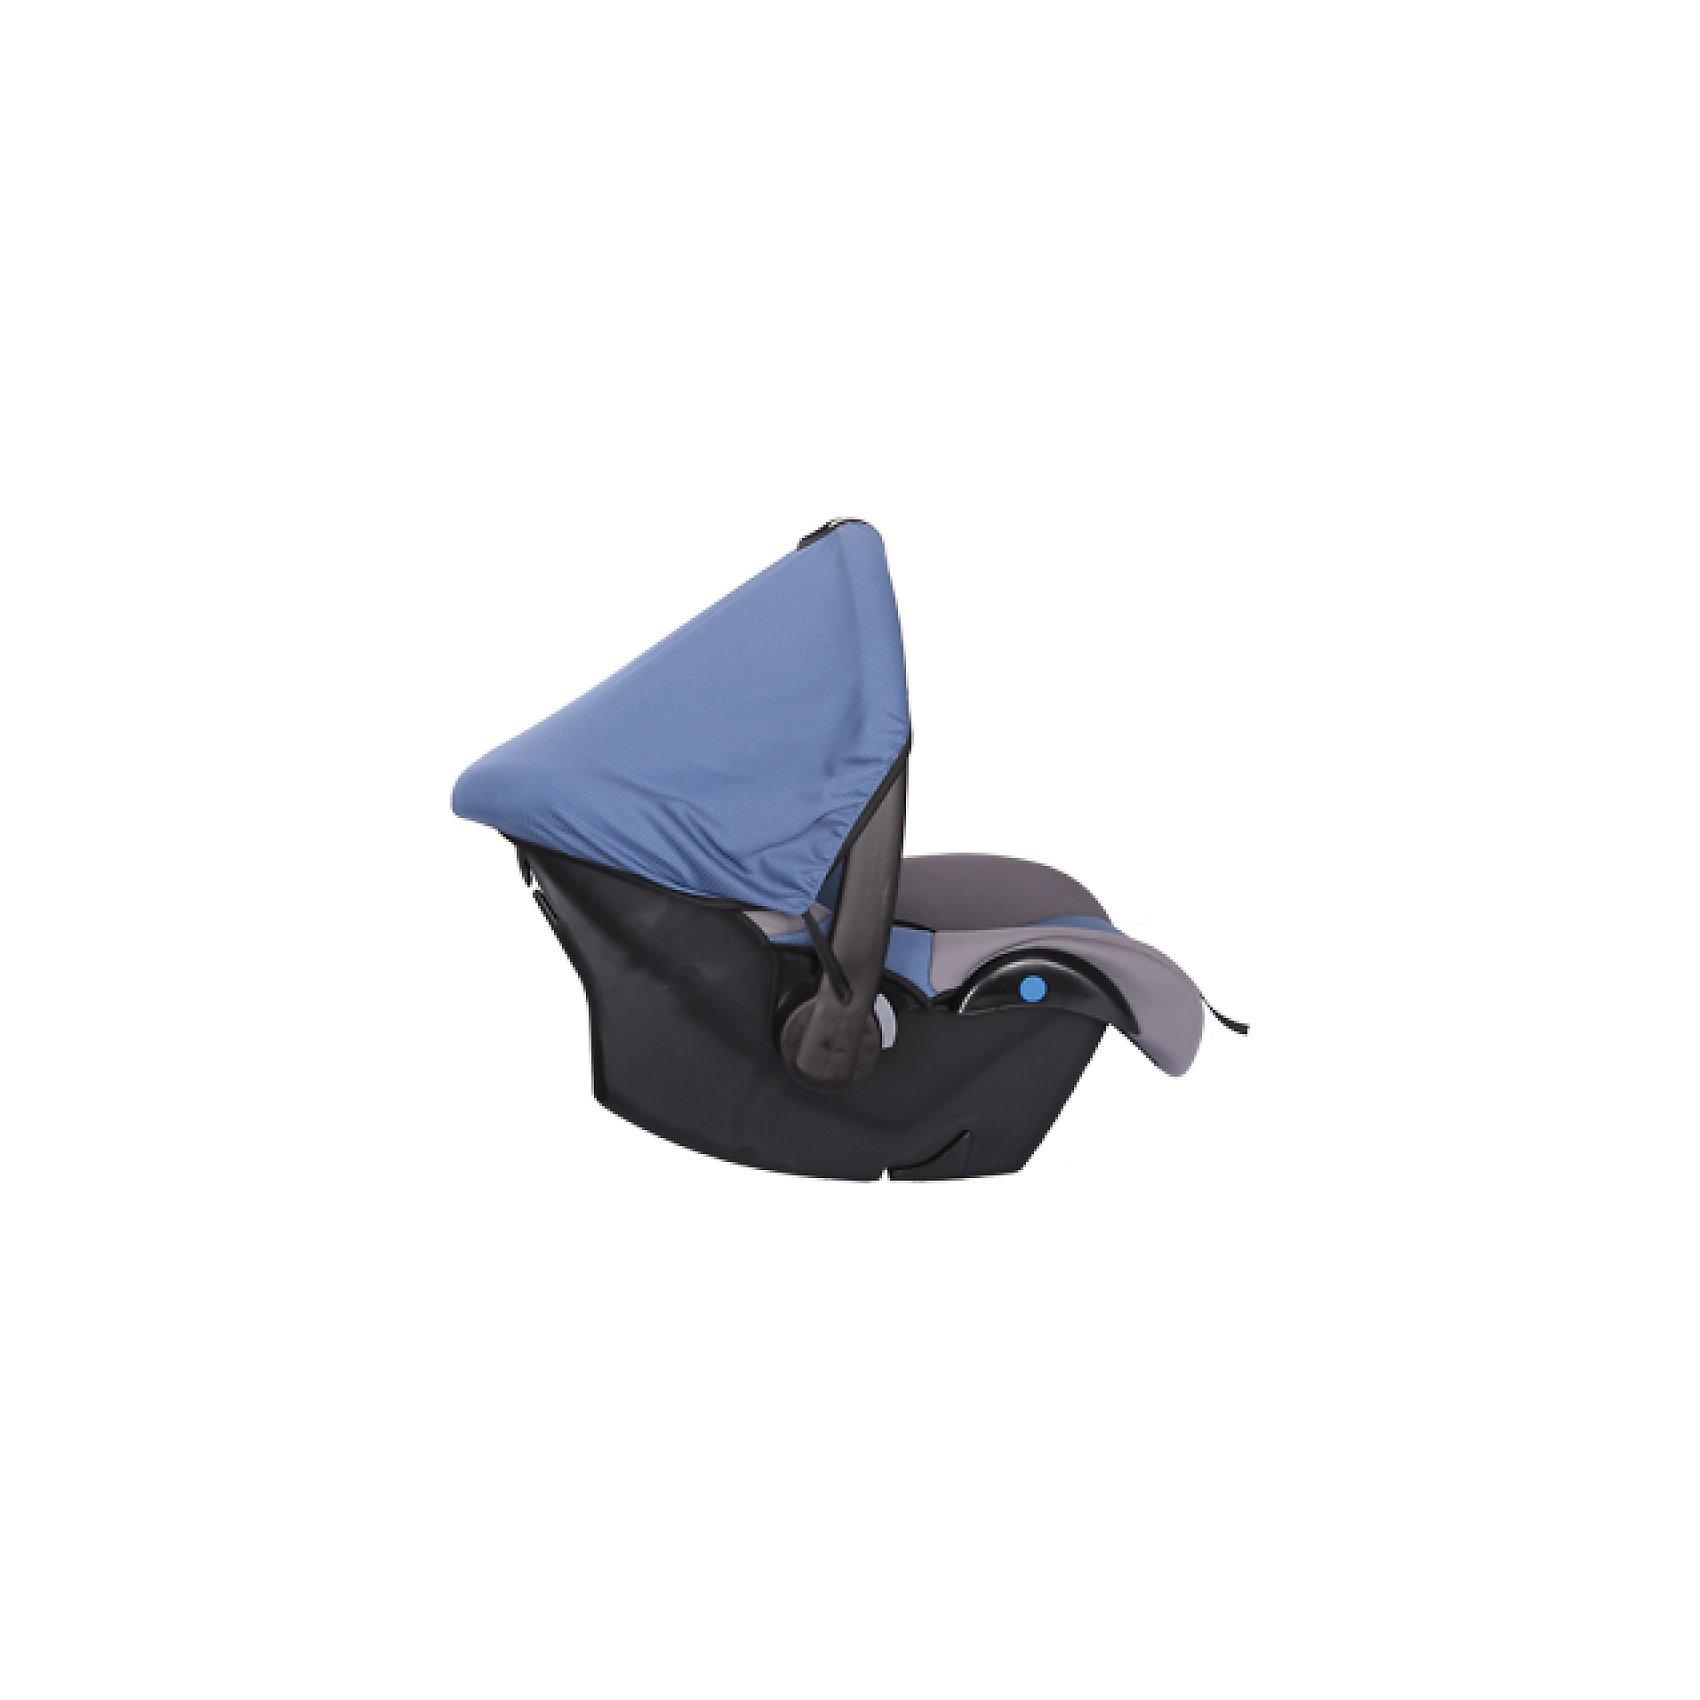 Автокресло Zlatek Colibri 0-13 кг, синий